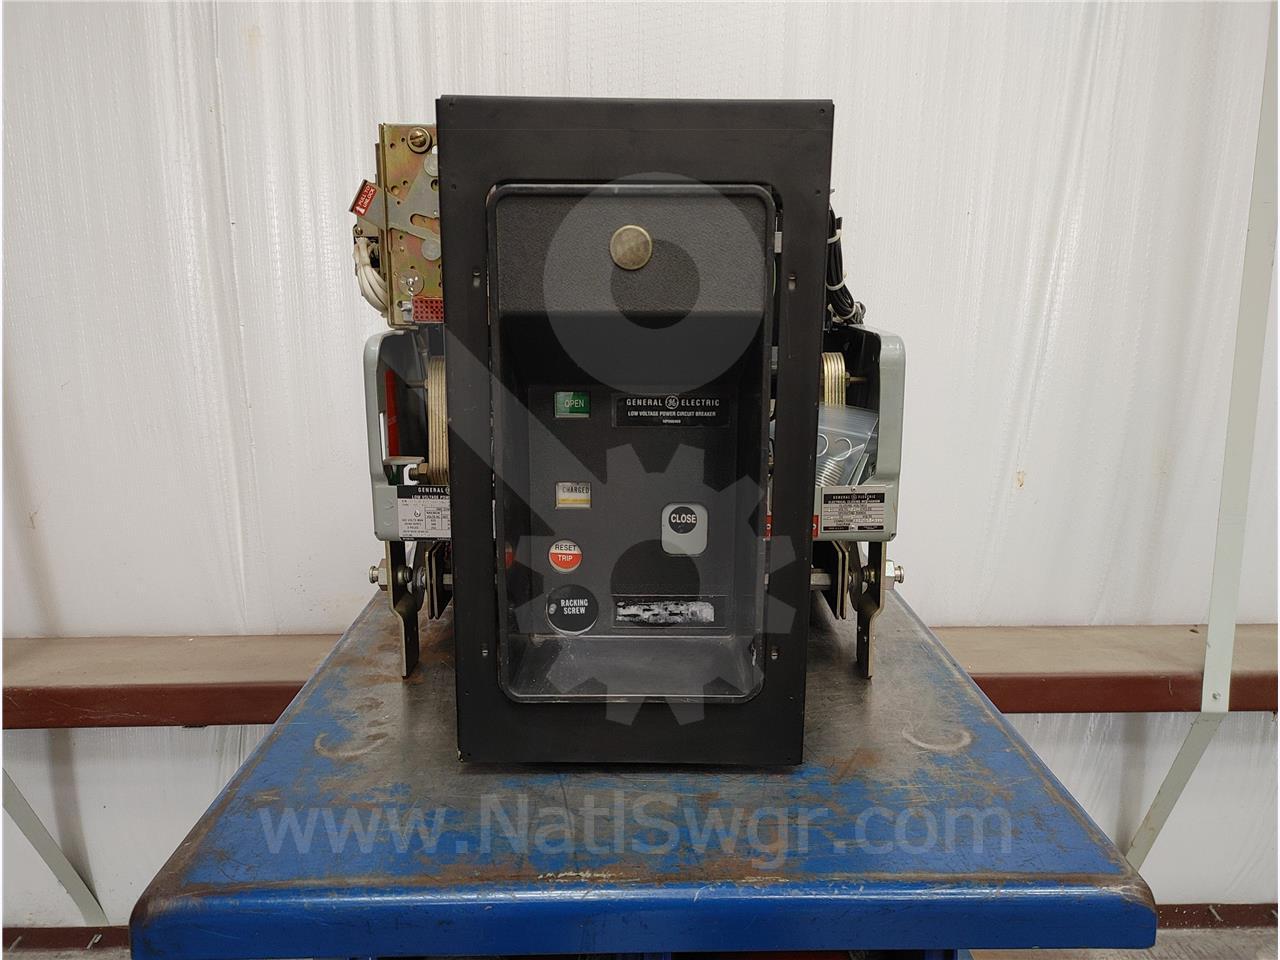 General Electric 800A GE AKR-10D-30 MO/DO